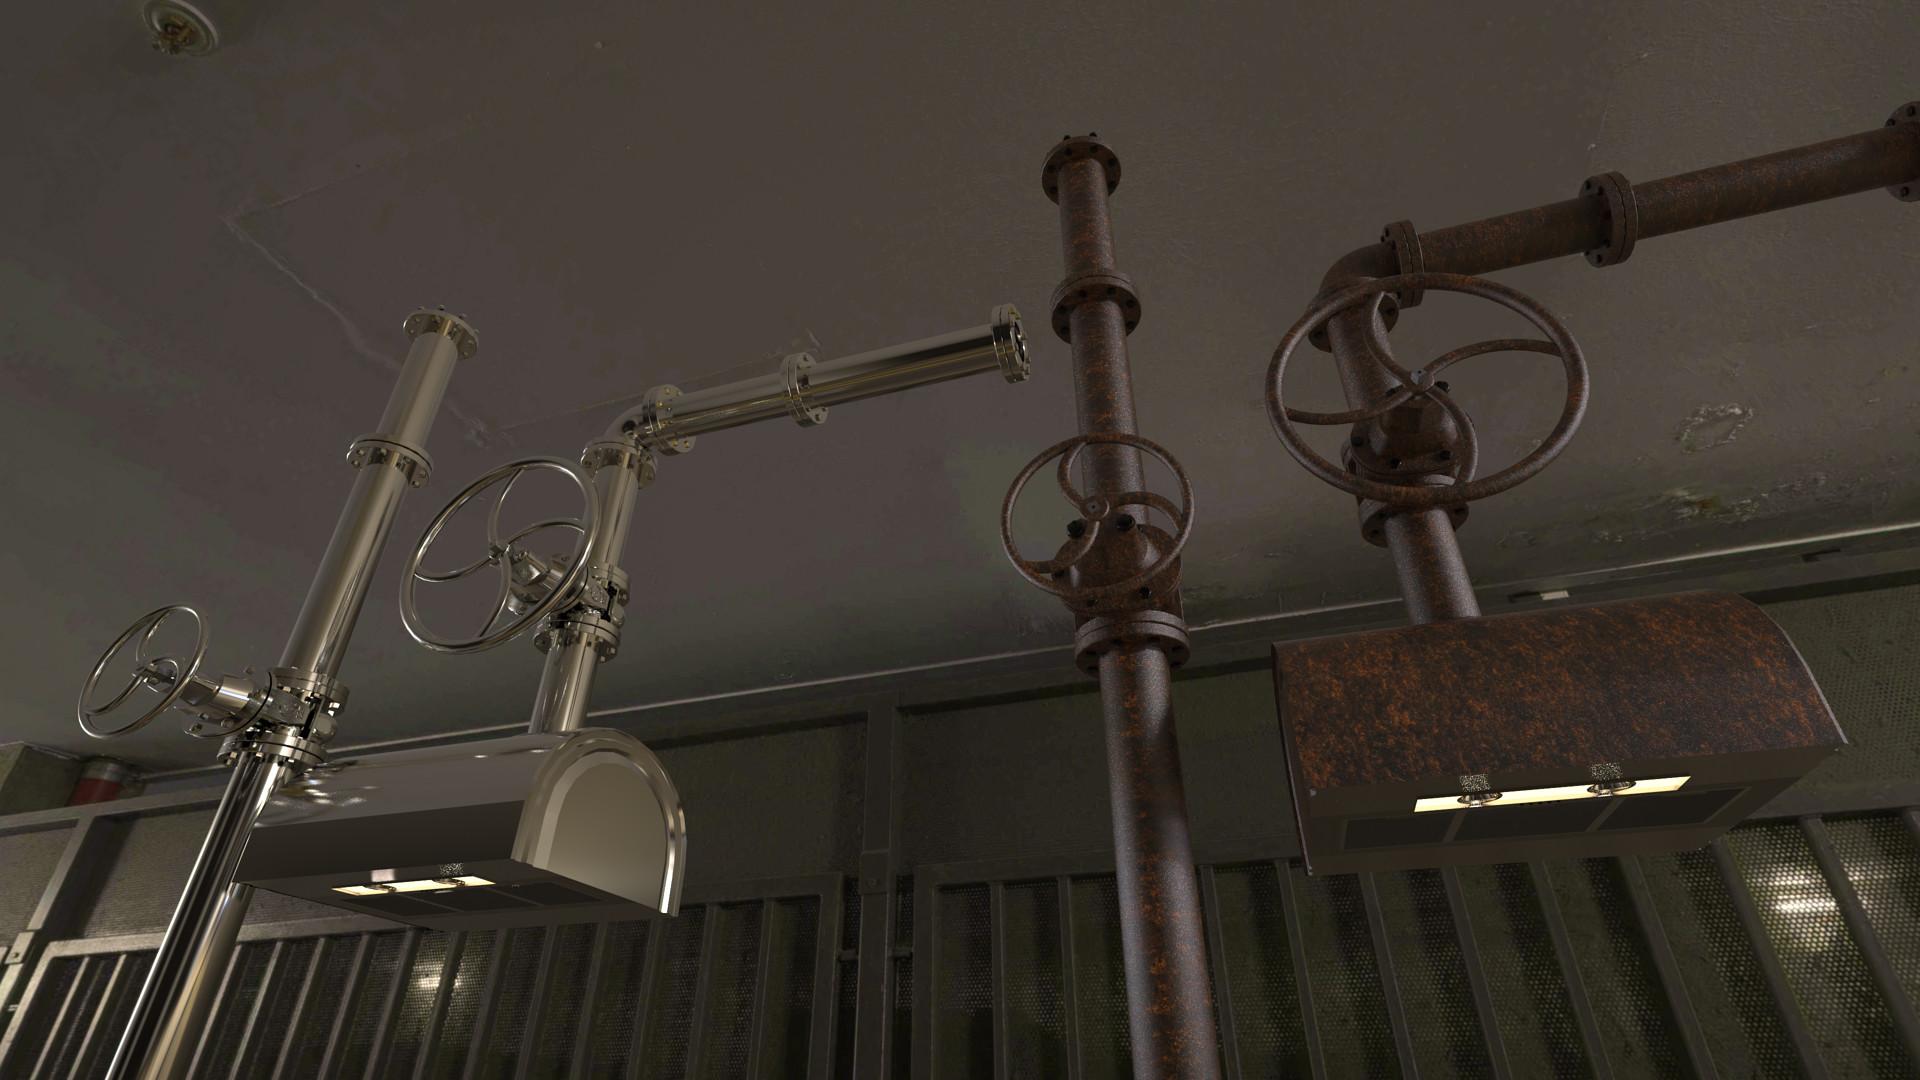 Duane kemp rivendell stainless steel and rust uv 0